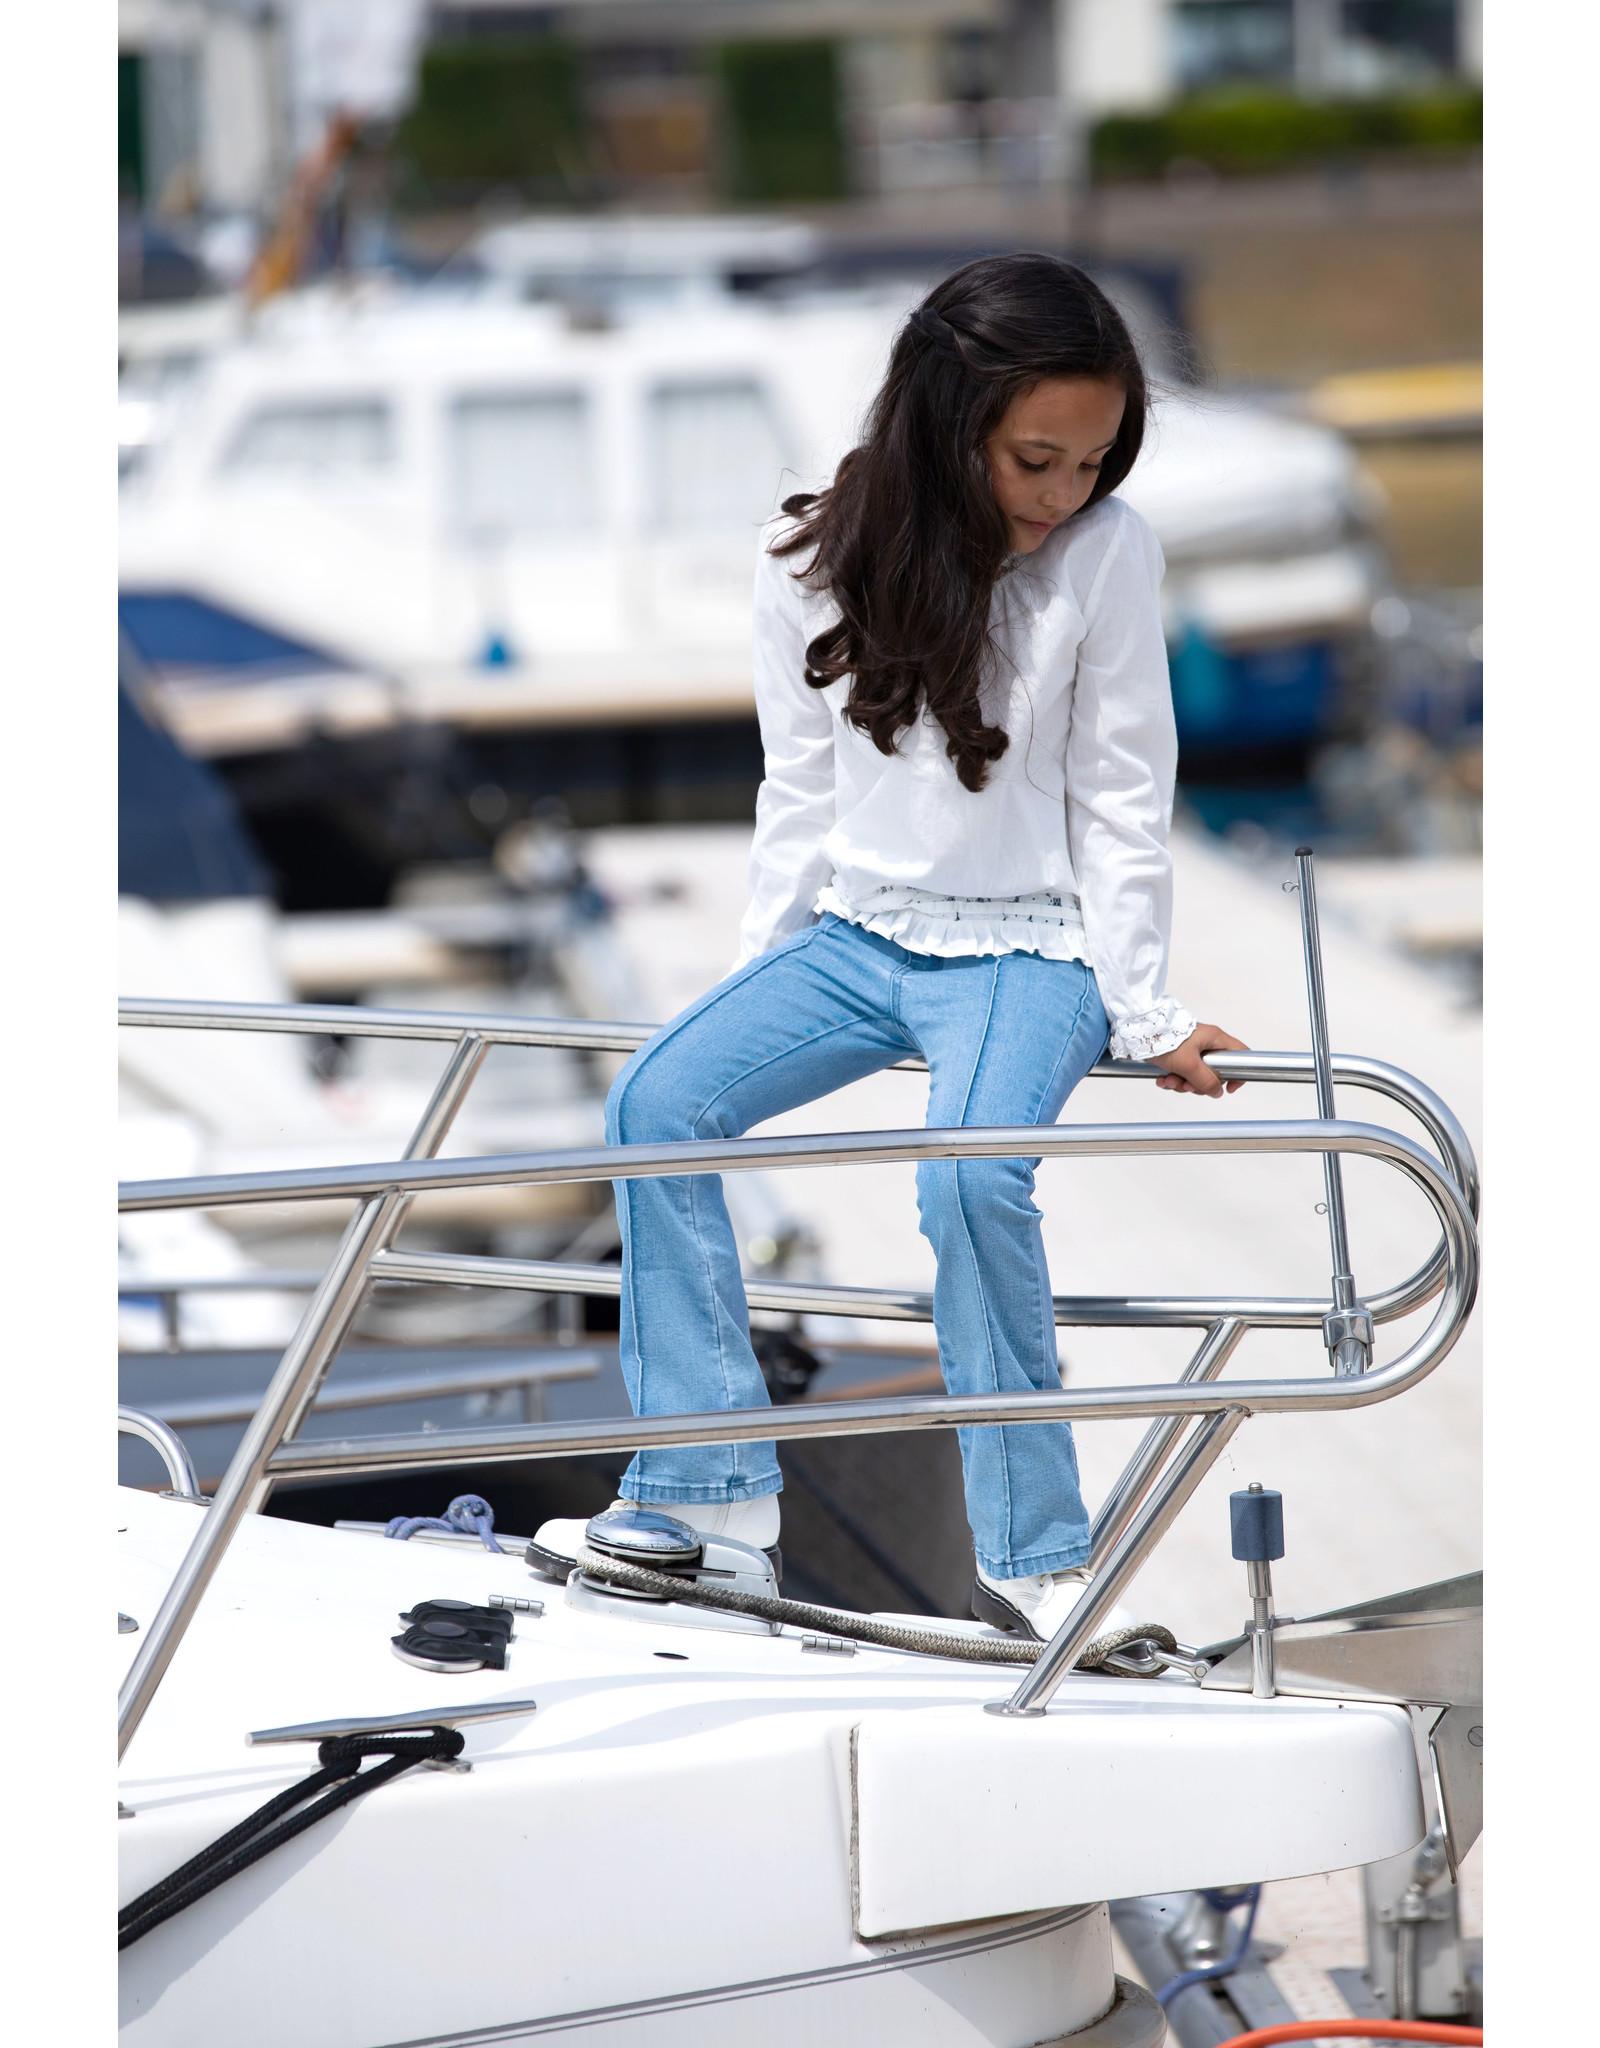 B-Nosy Girls denim flair pants, ruffles at front pockets, Free denim